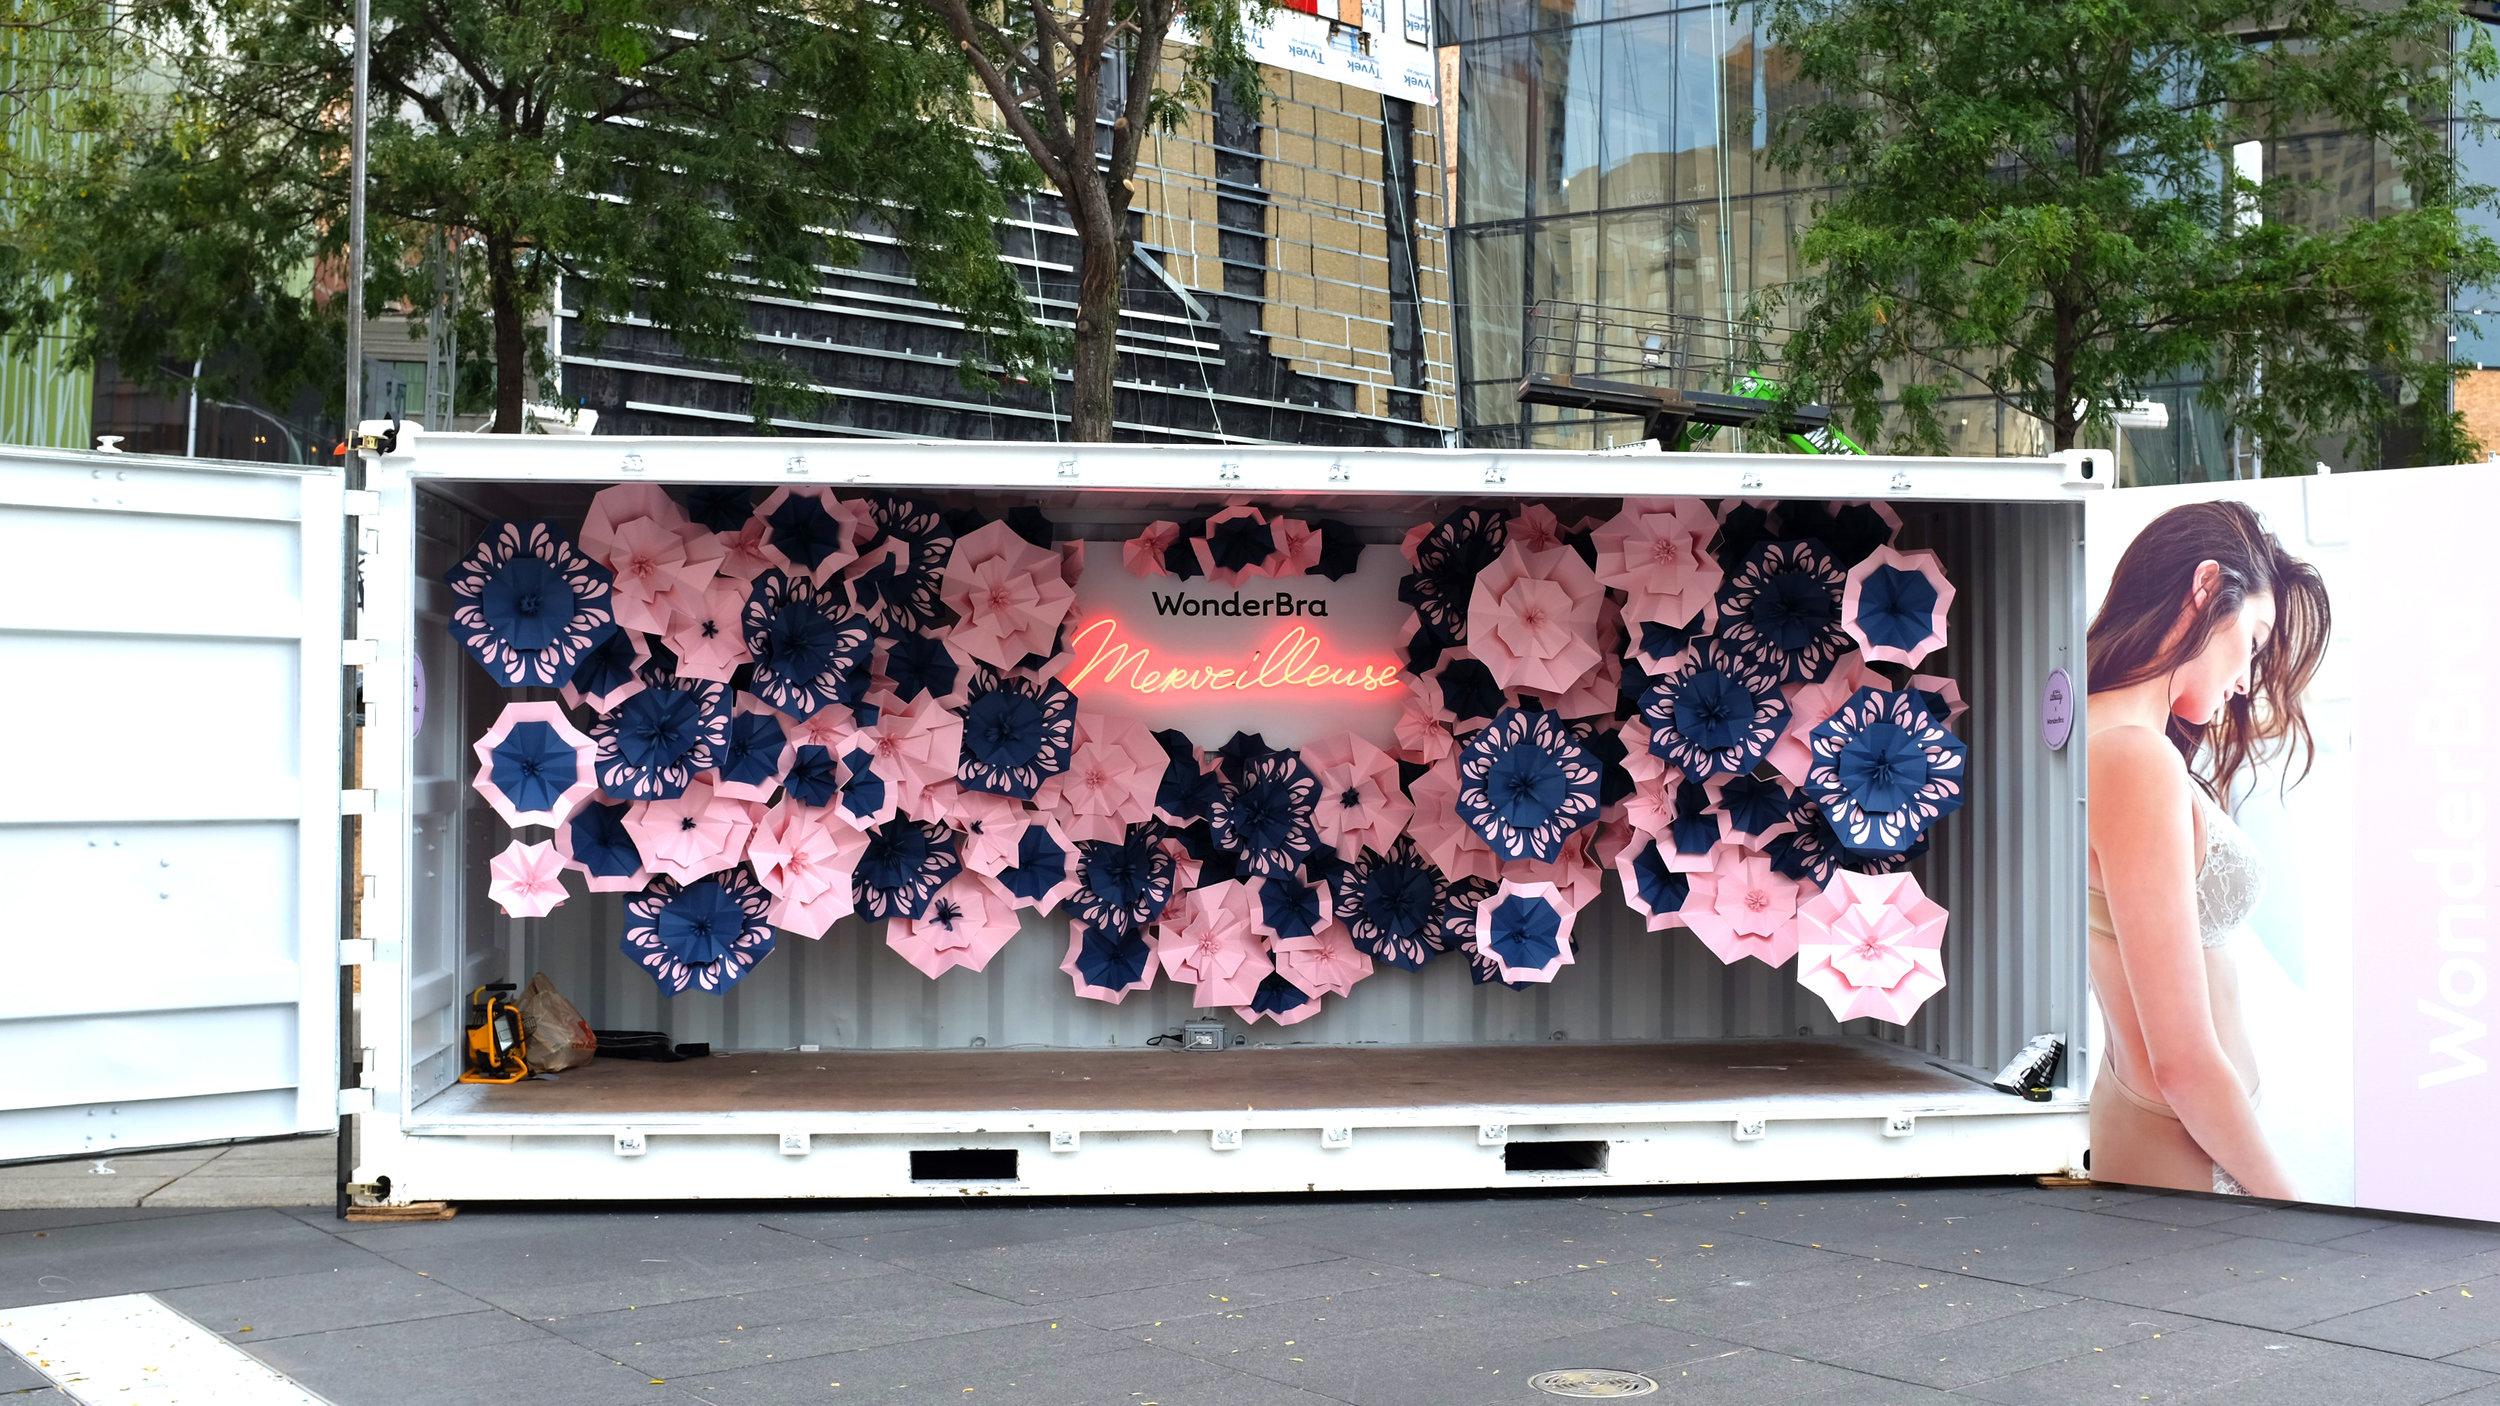 MISS-CLOUDY-PAULINE-LOCTIN-WONDERBRA-POP-UP-STORE-FESTIVAL-MODE-DESIGN-FLOWER-PAPER-ART-ORIGAMI-FOLD-COLORPLAN